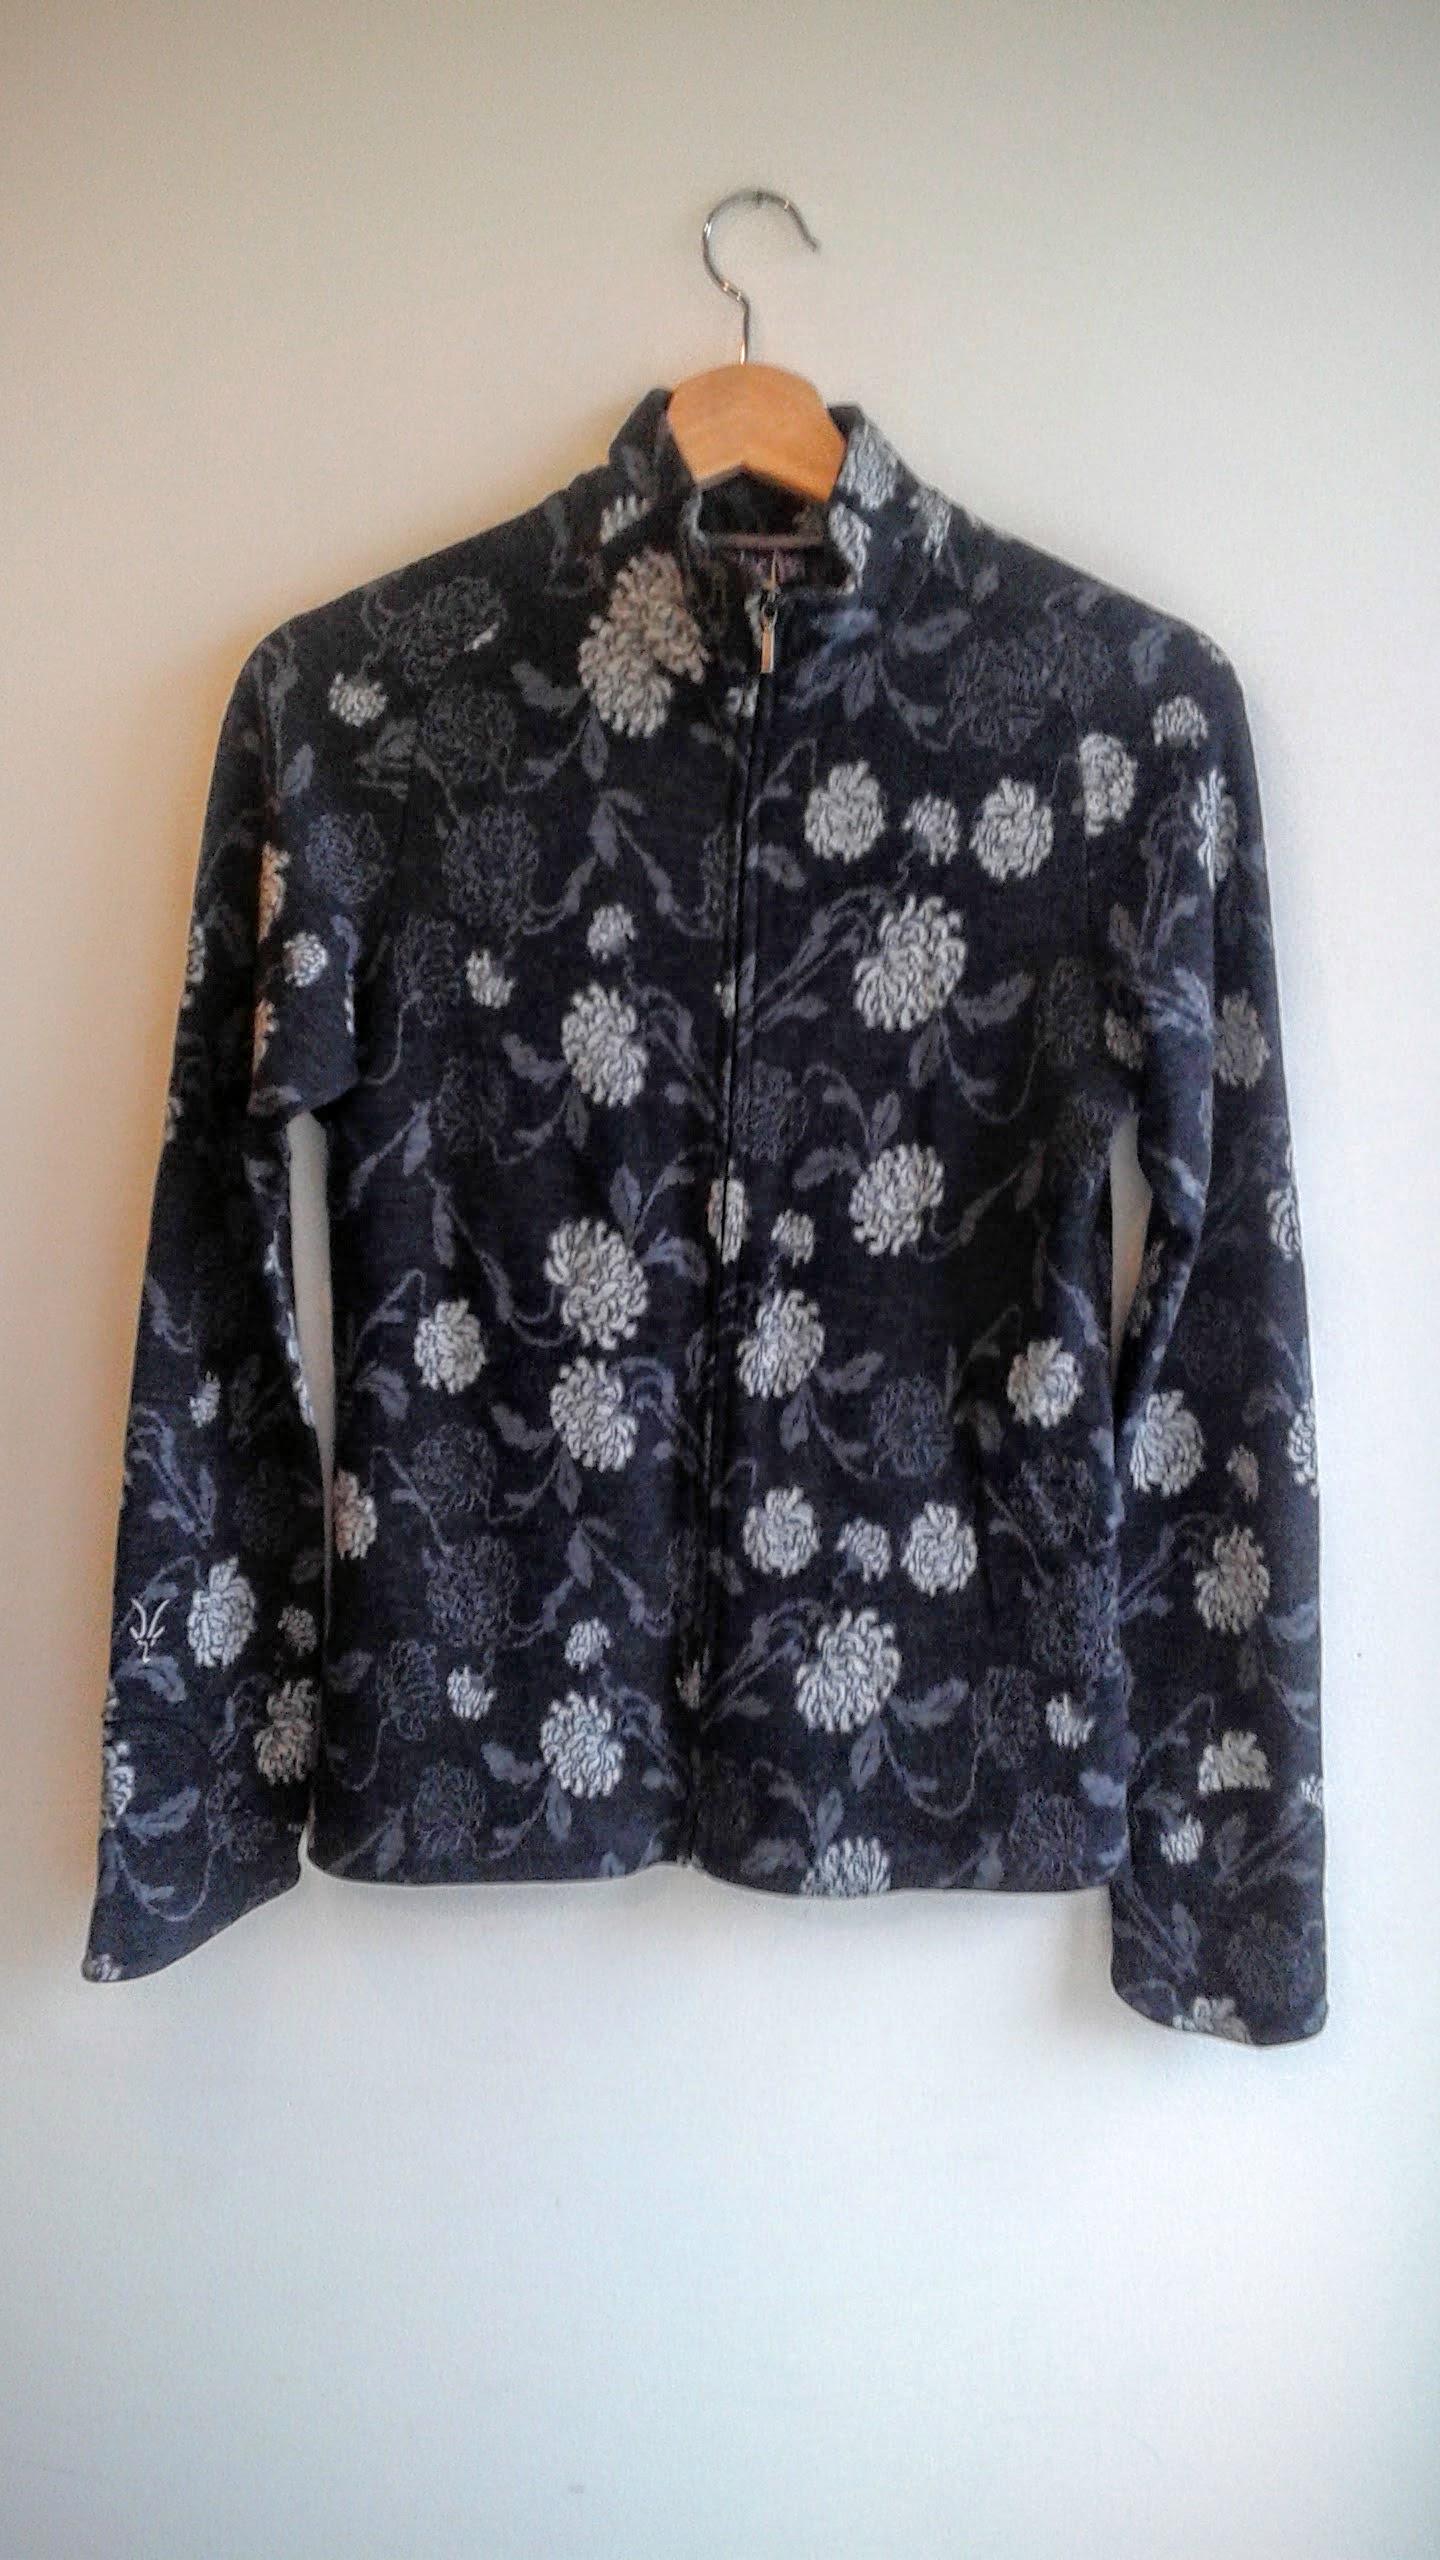 Ibex sweater; Size M, $26